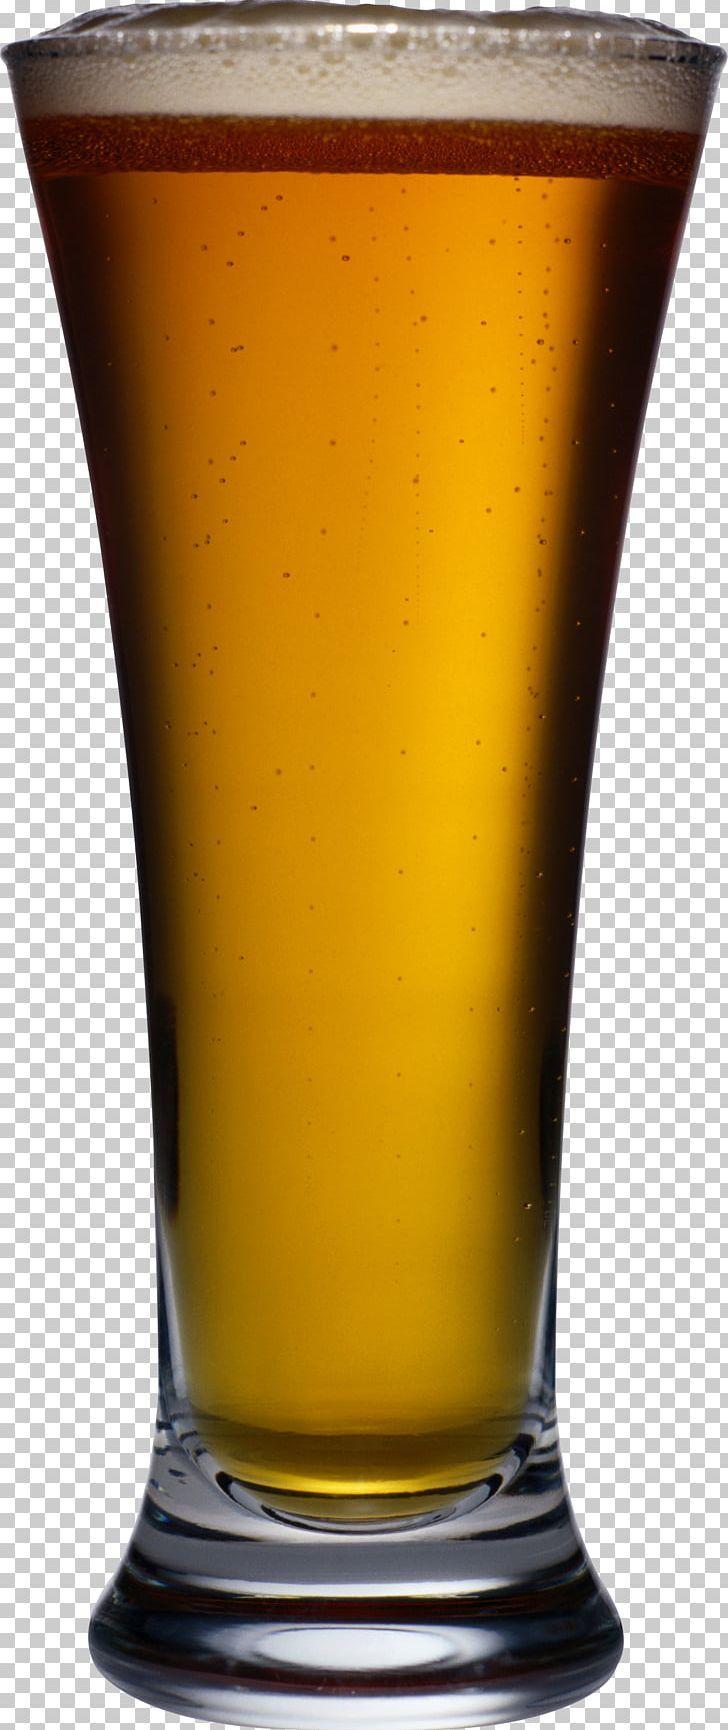 Beer Glassware Drink Png Alcoholic Drink Bar Beer Beer Bottle Beer Brewing Grains Malts Beer Glassware Beer Beer Illustration